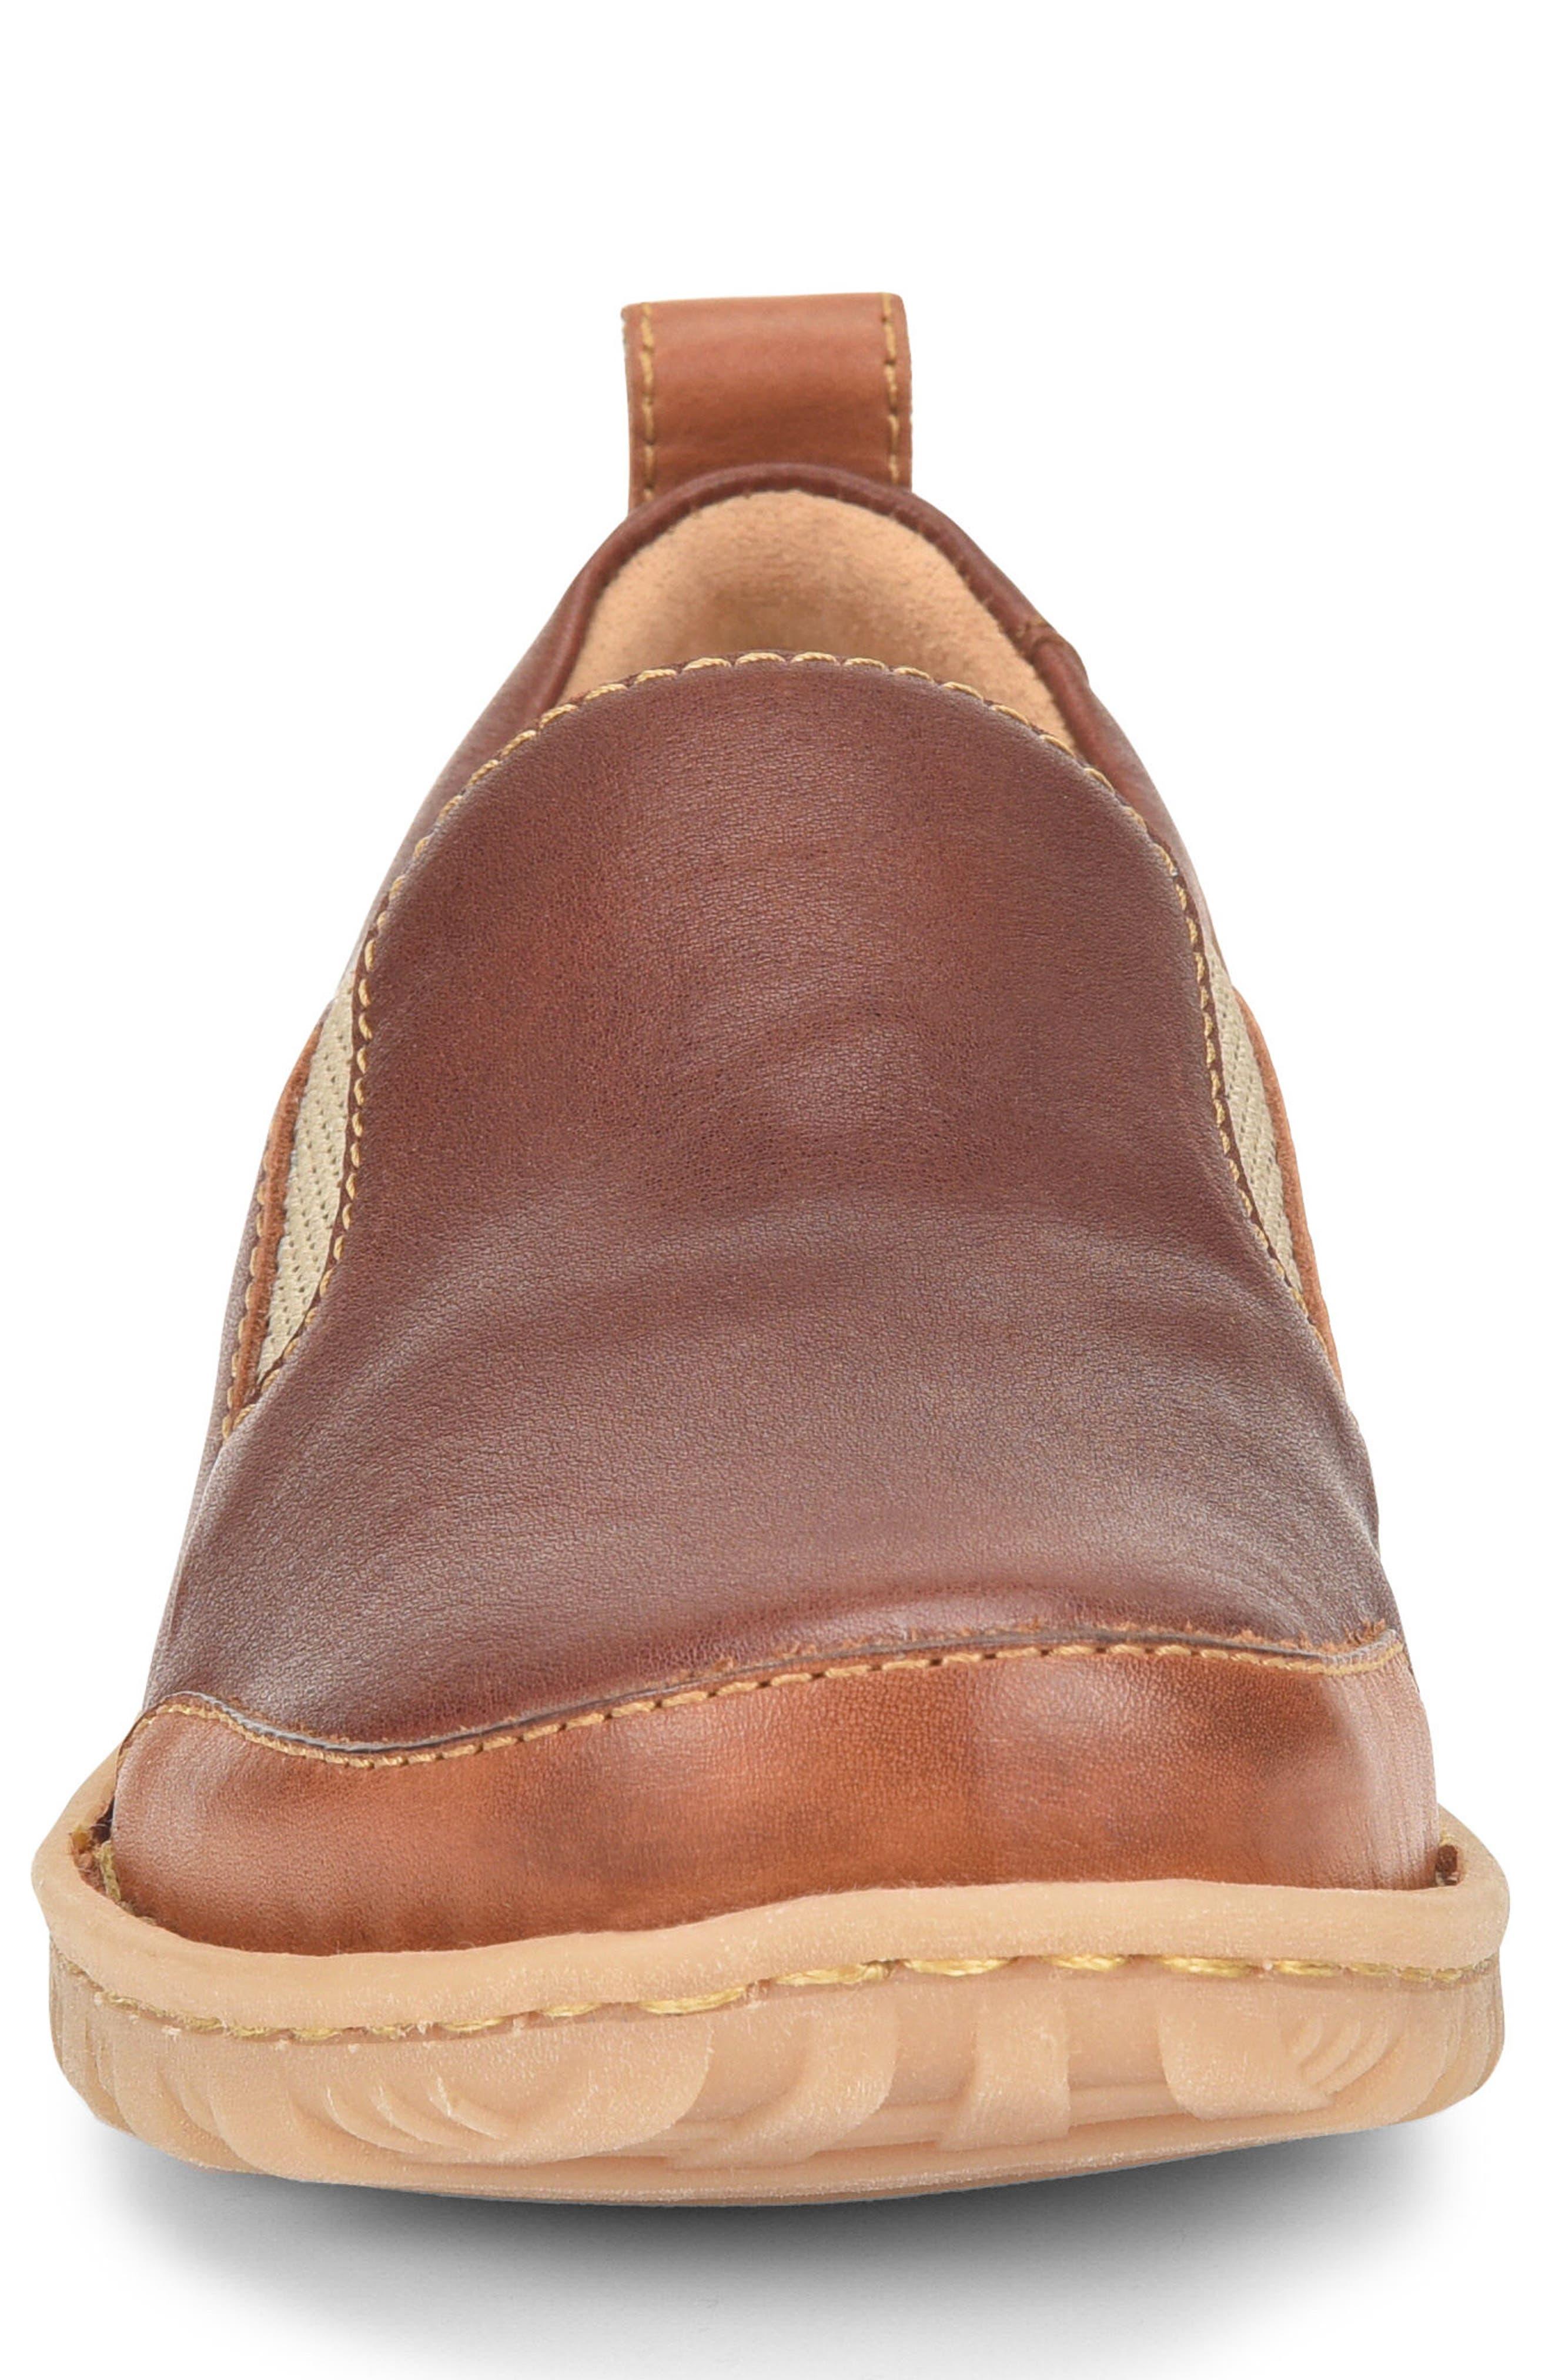 Pepper Slip-On,                             Alternate thumbnail 3, color,                             Brown/ Rust Leather